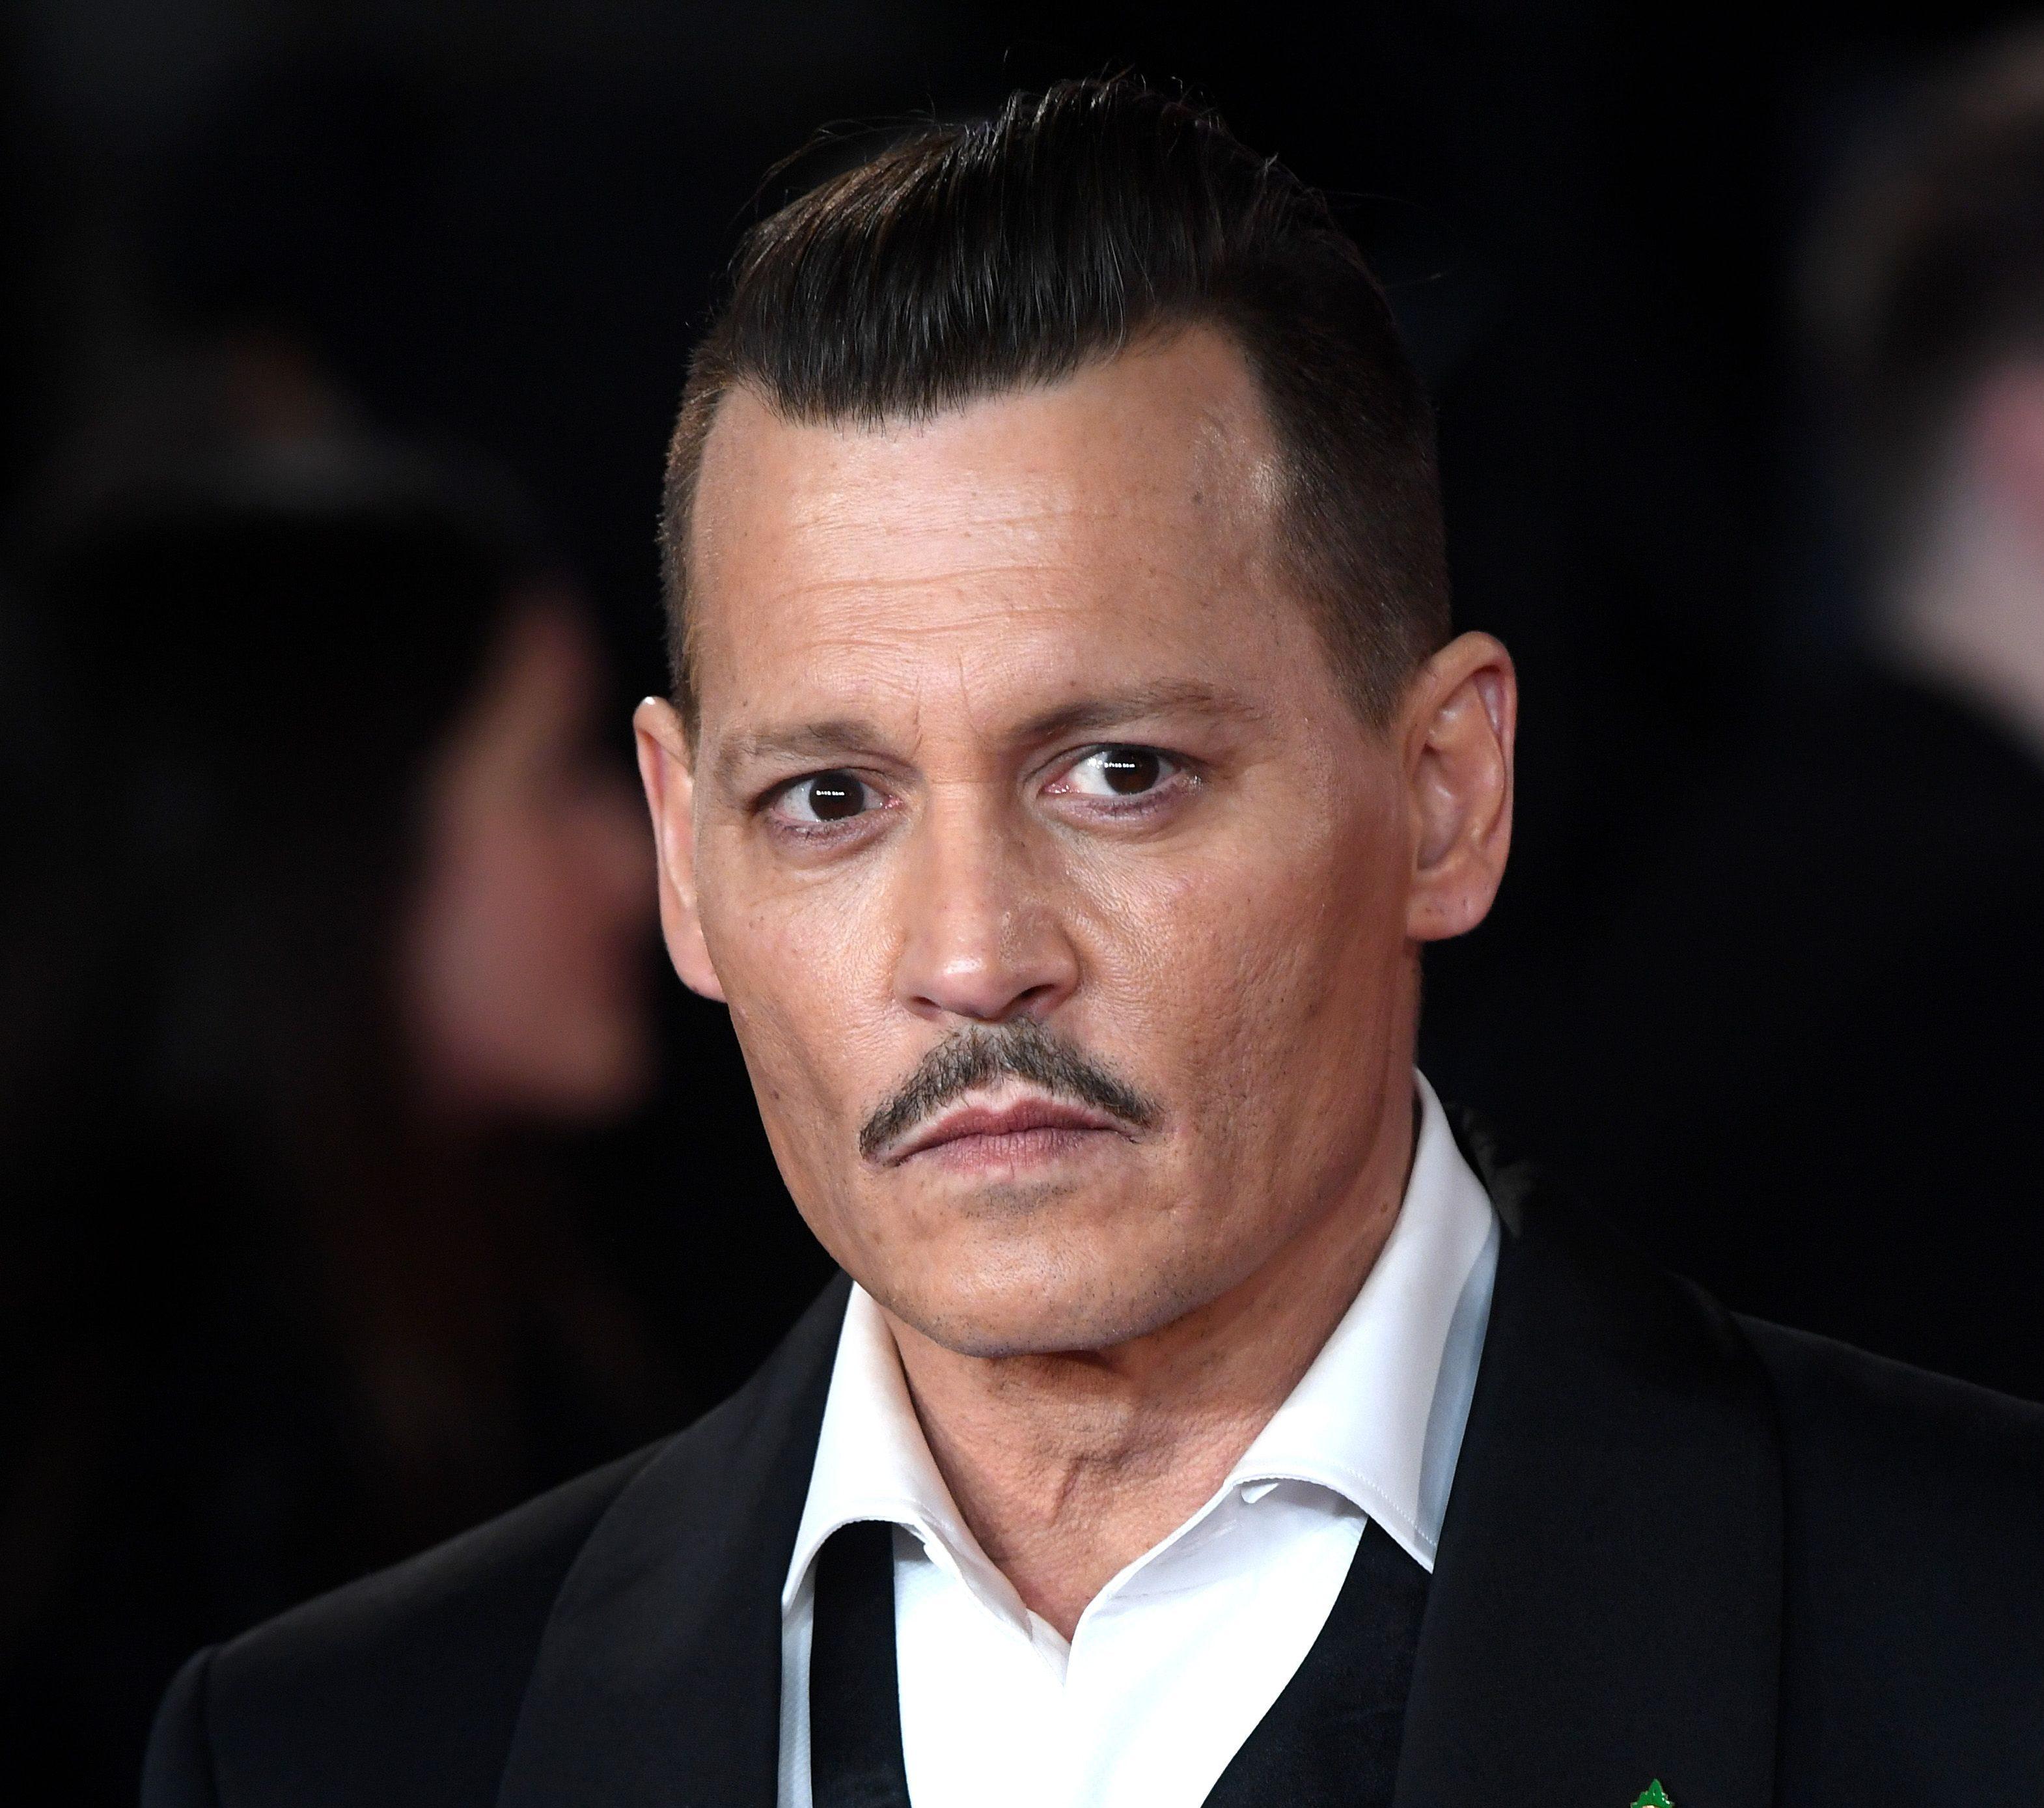 Johnny Depp'Murder on the Orient Express' film premiere, Arrivals, London, UK - 02 Nov 2017